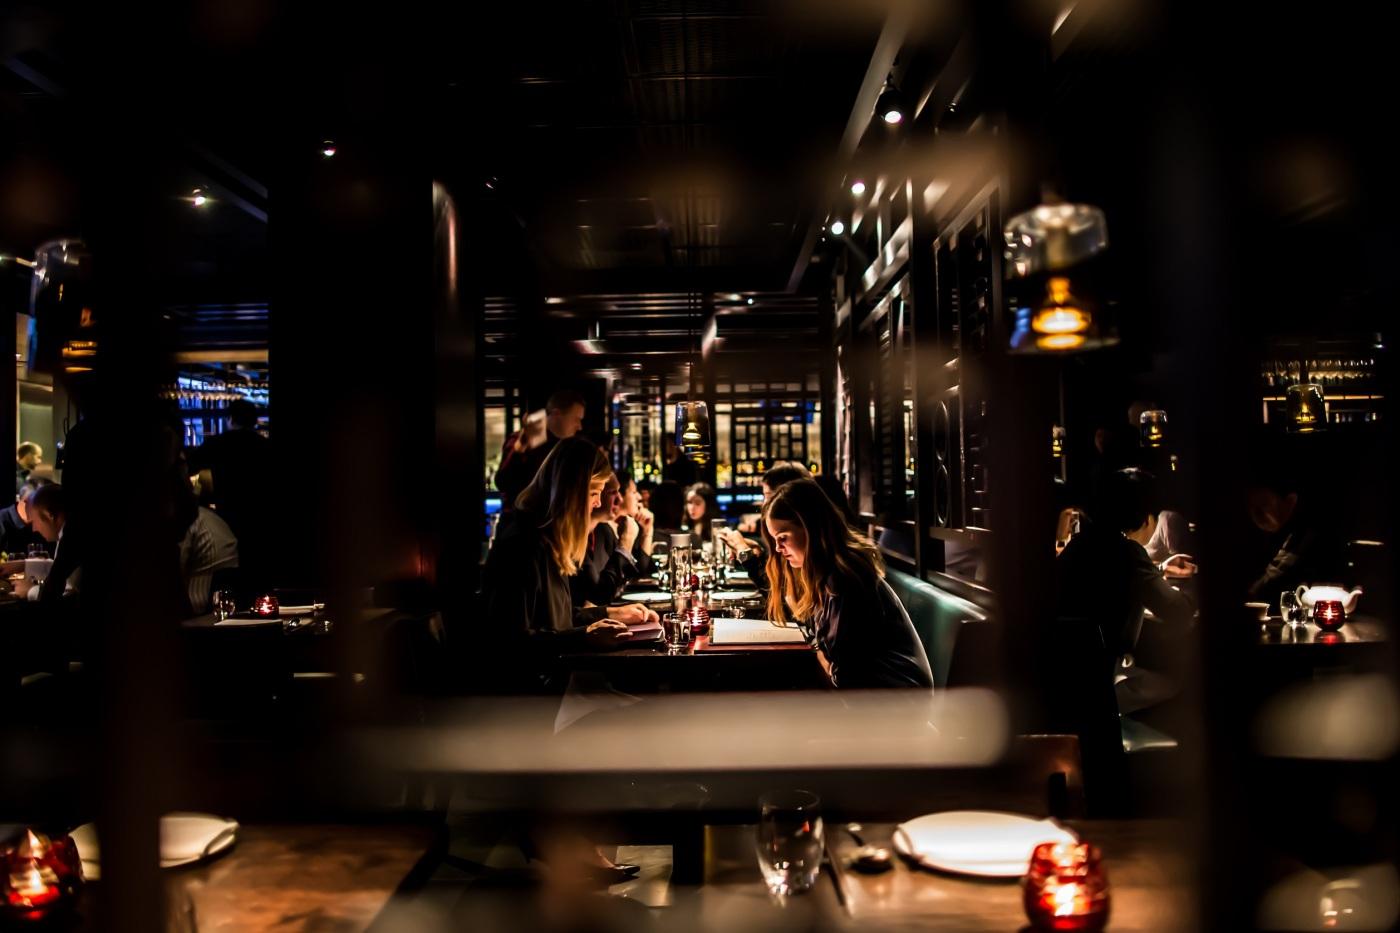 restaurant-Hakkasan group.Hakkasan Mayfair.22.10.14-230